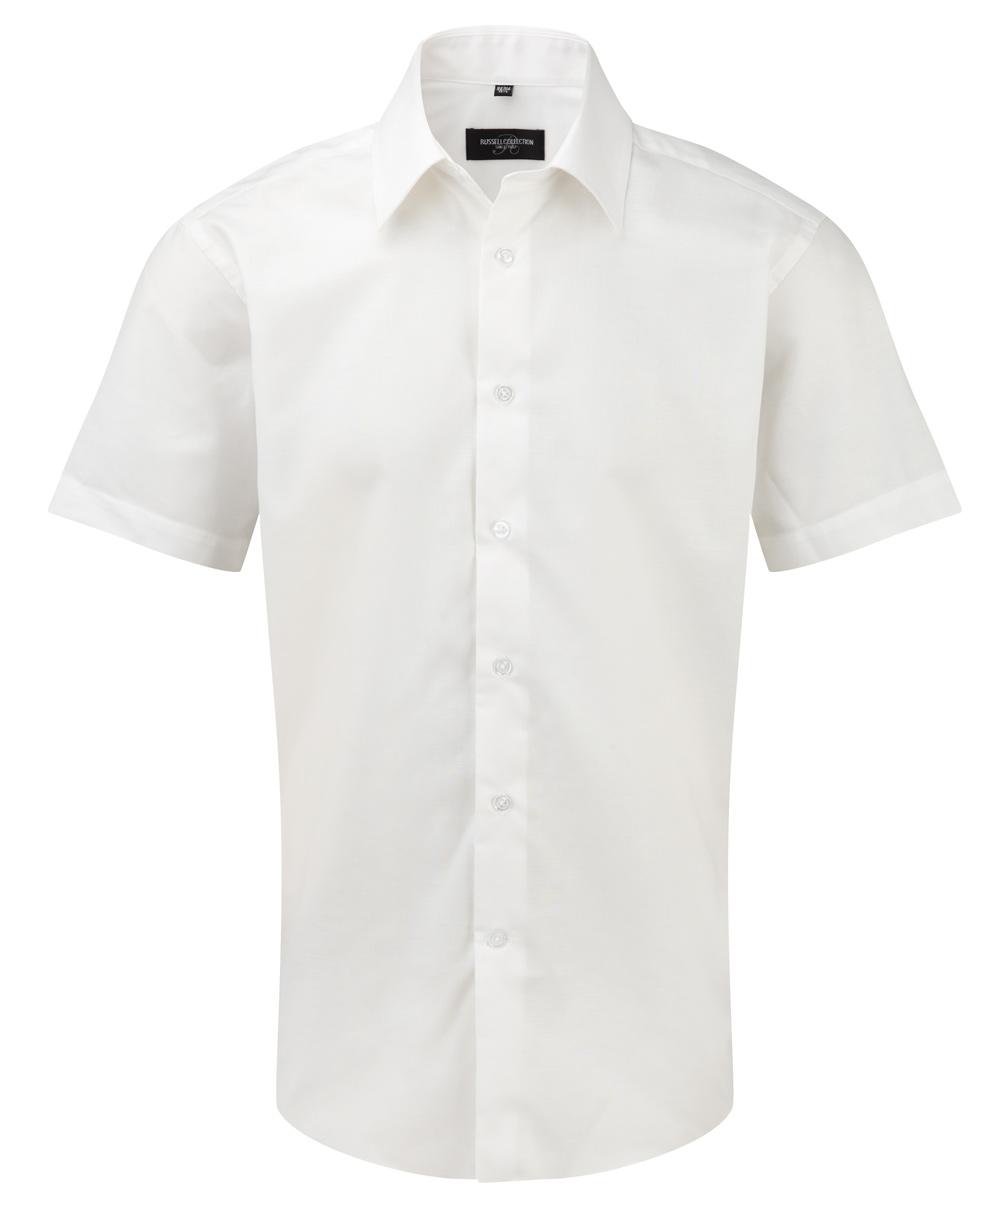 Oxford tailored Herrenhemd kurzarm